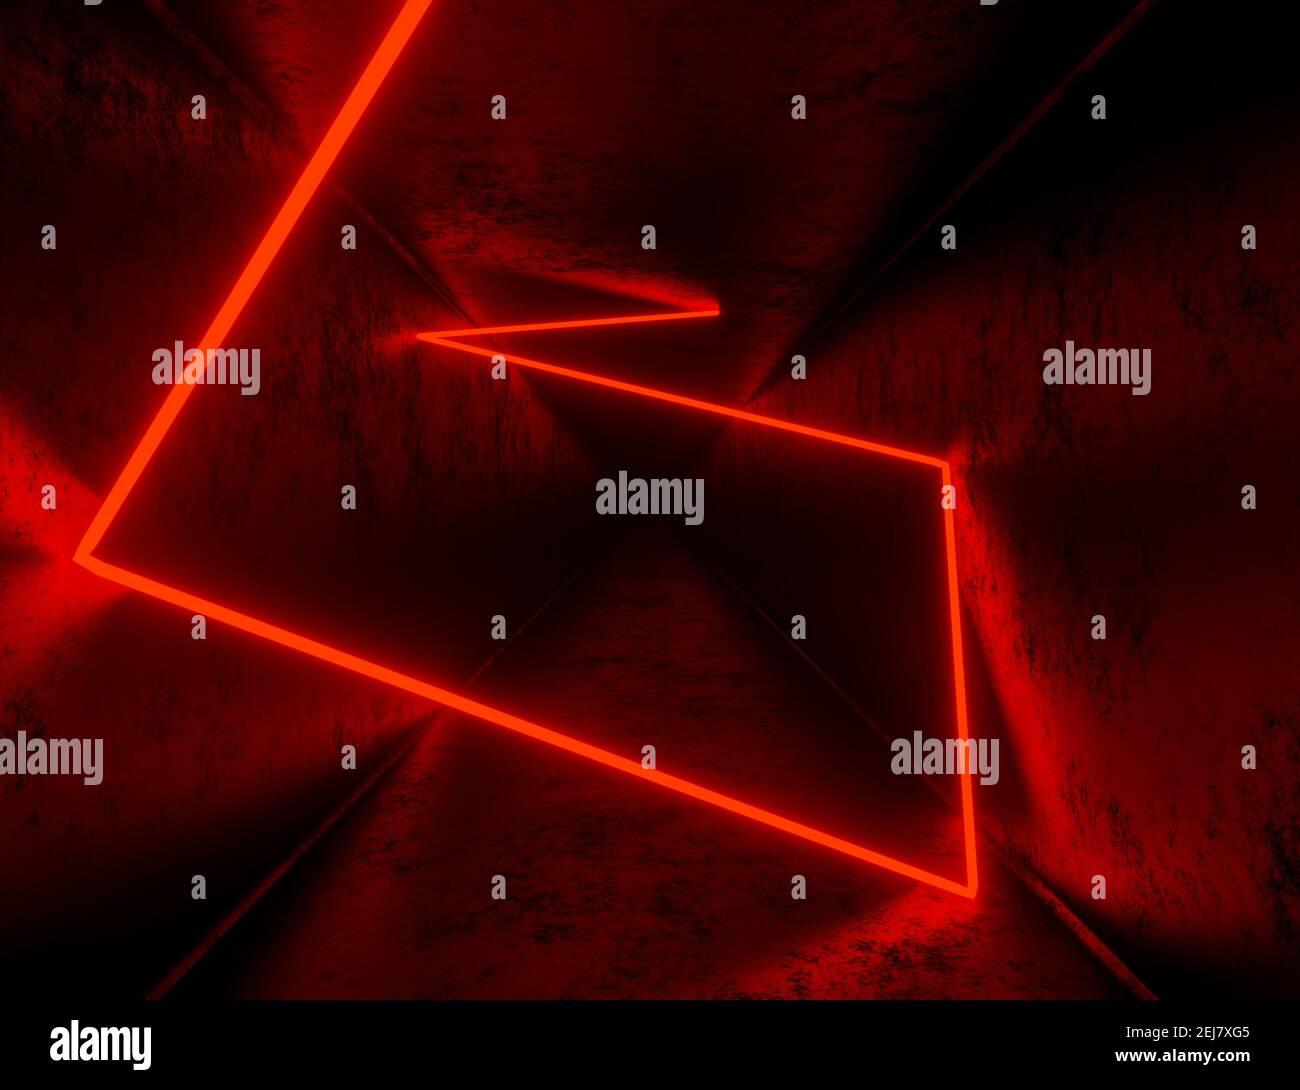 presentación en 3d, fondo de túnel abstracto con luces de neón rojas Foto de stock